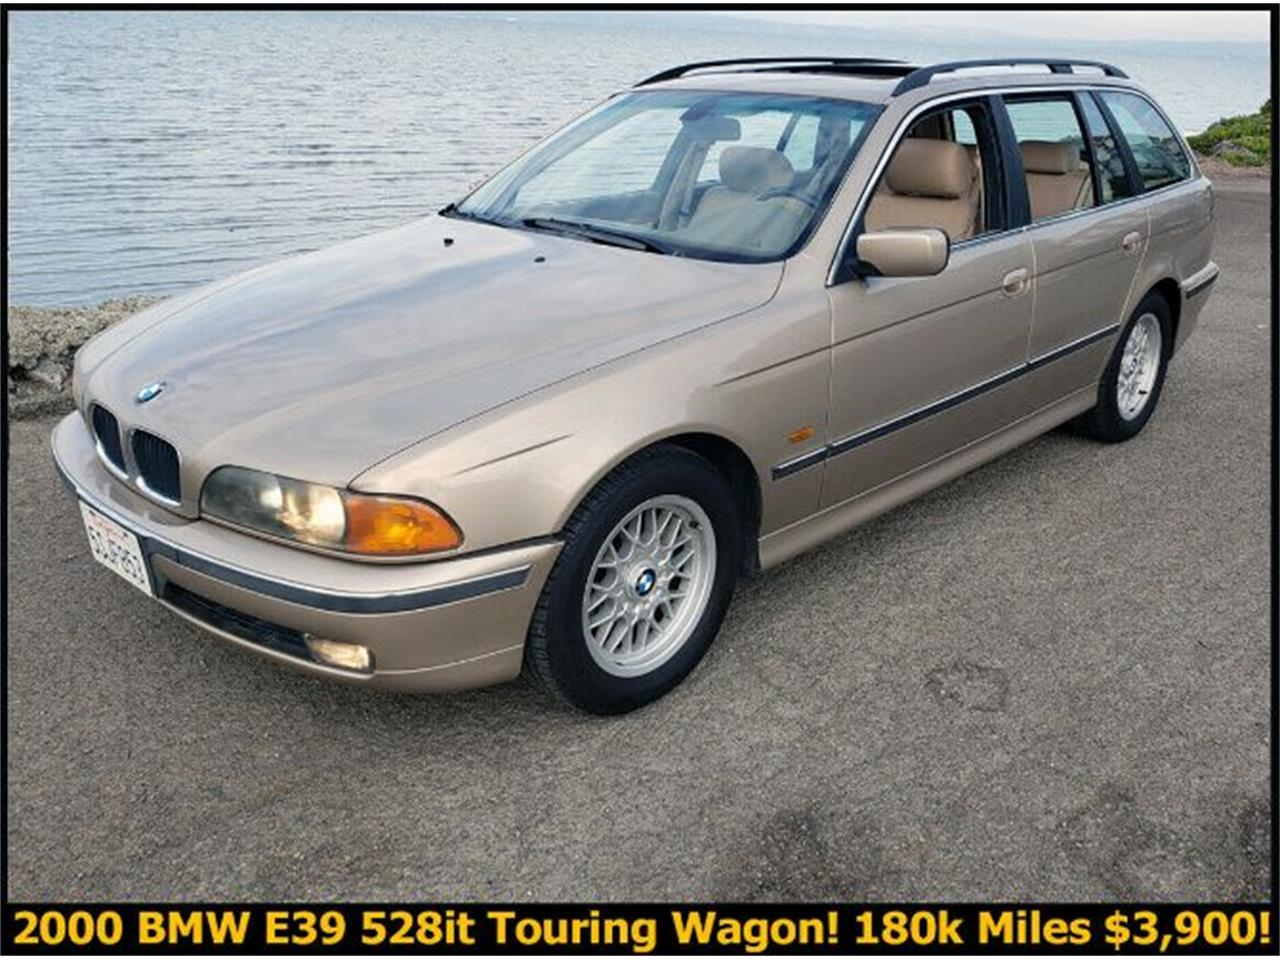 for sale 1999 bmw 5 series in cadillac, michigan cars - cadillac, mi at geebo